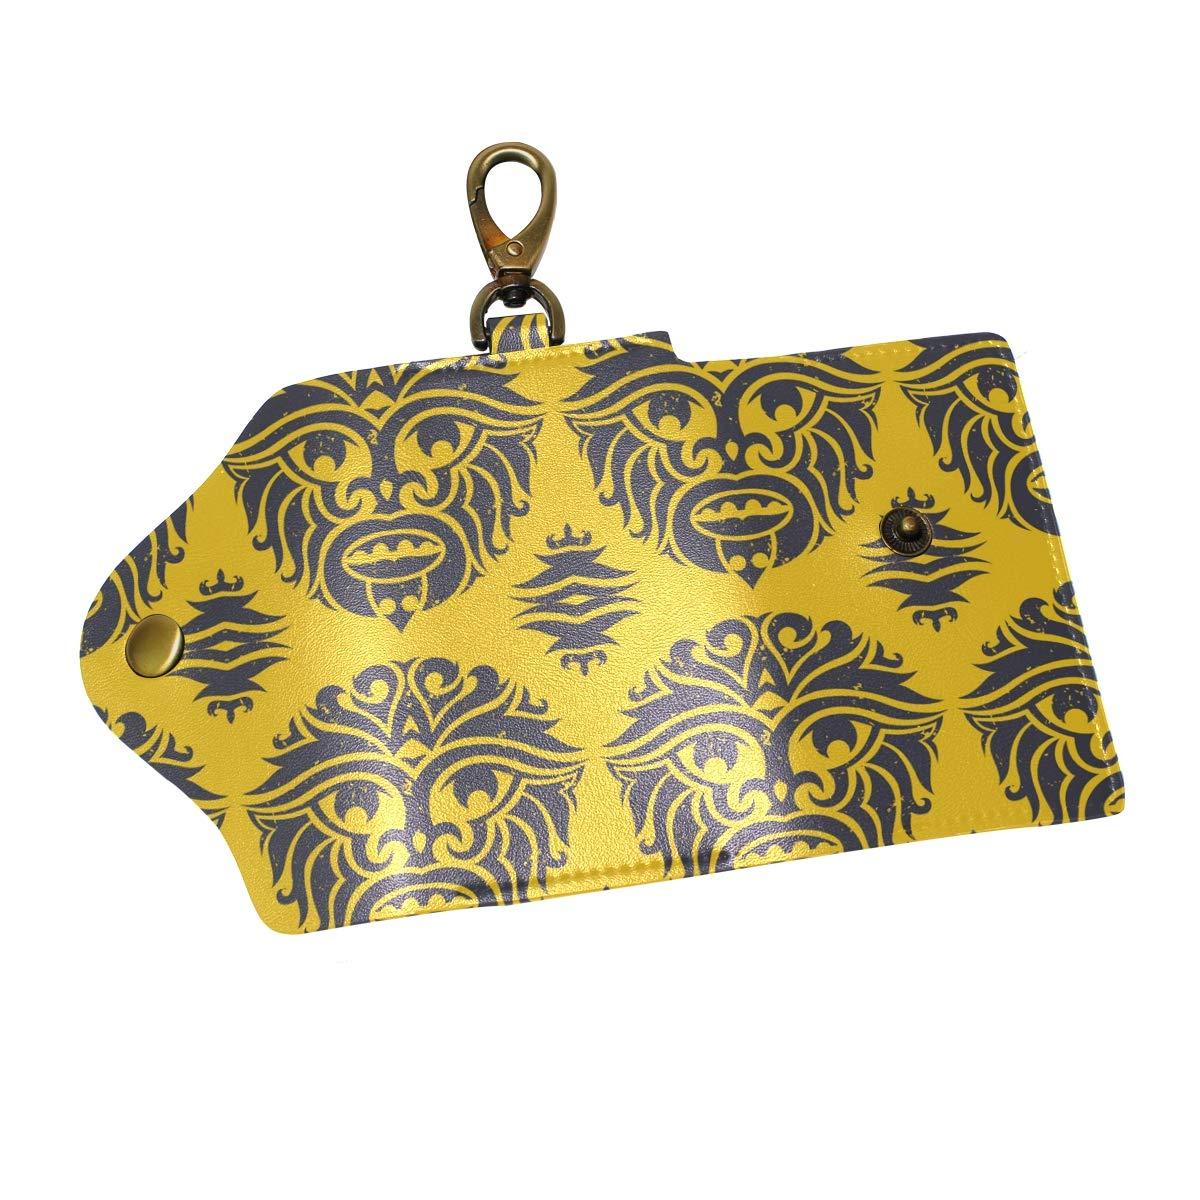 KEAKIA Tribal Monkey Mask Leather Key Case Wallets Tri-fold Key Holder Keychains with 6 Hooks 2 Slot Snap Closure for Men Women